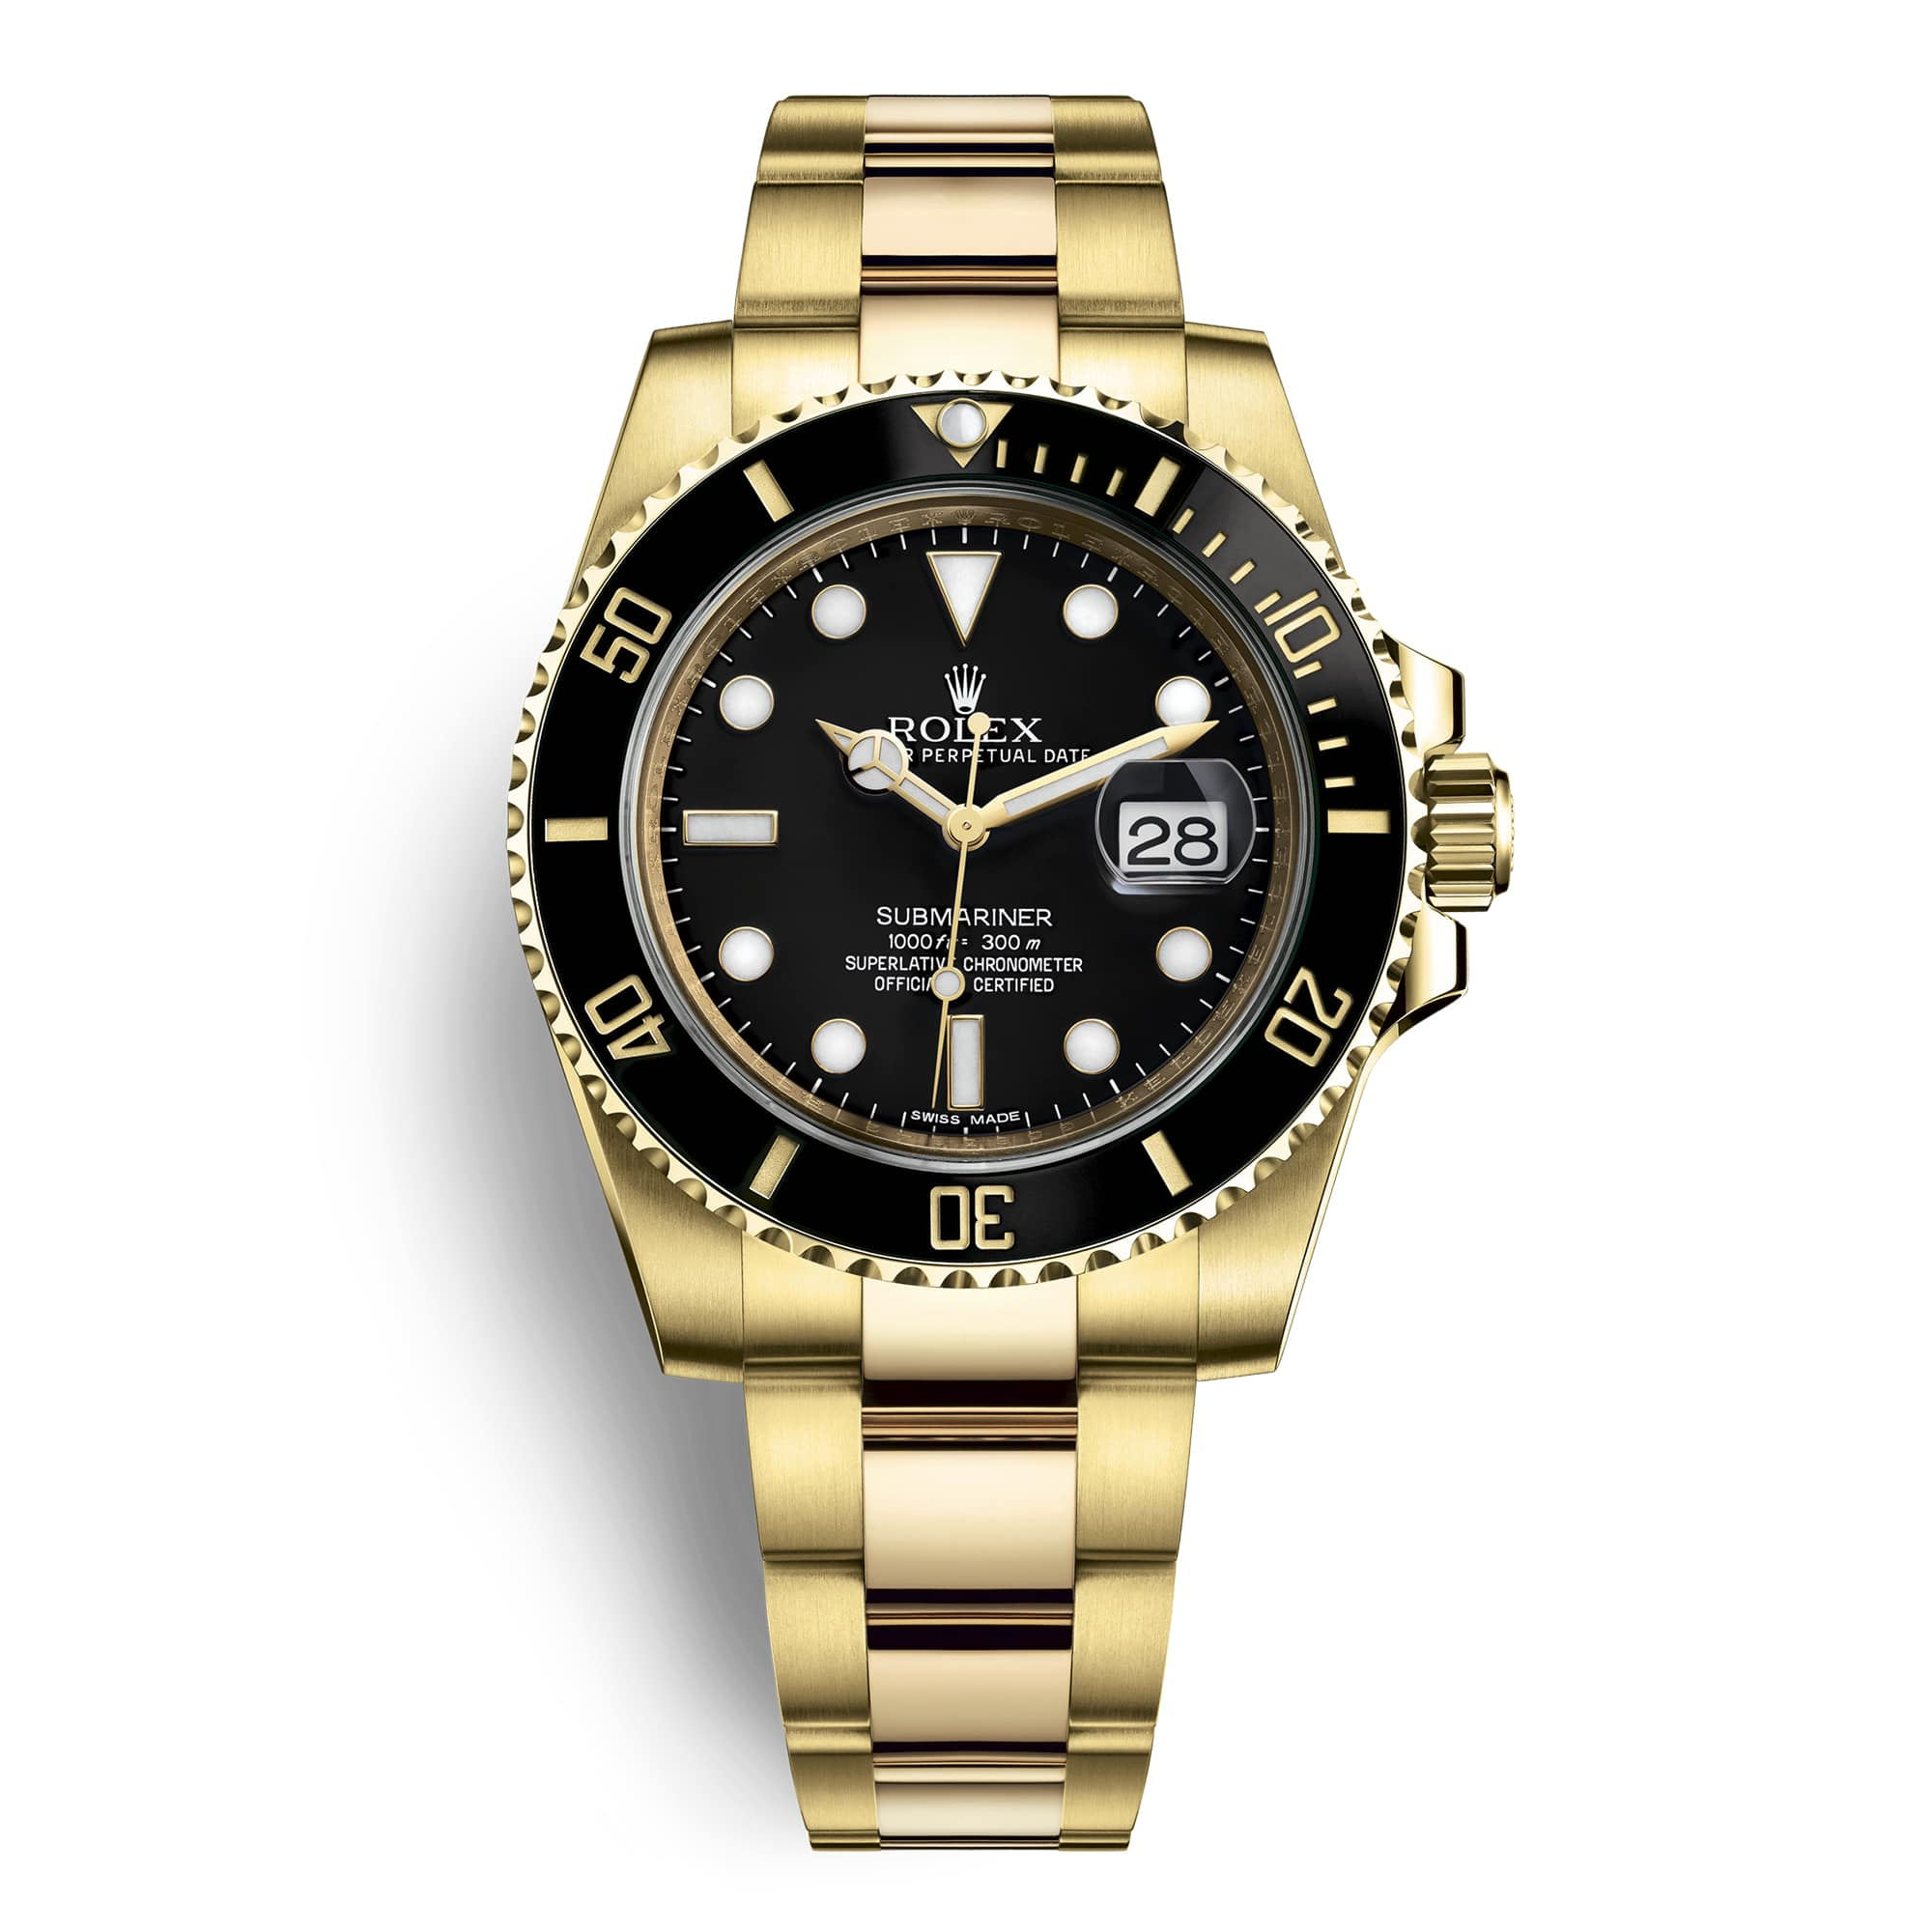 Rolex Submariner 116618LN for sale Mio Watches Jewelry